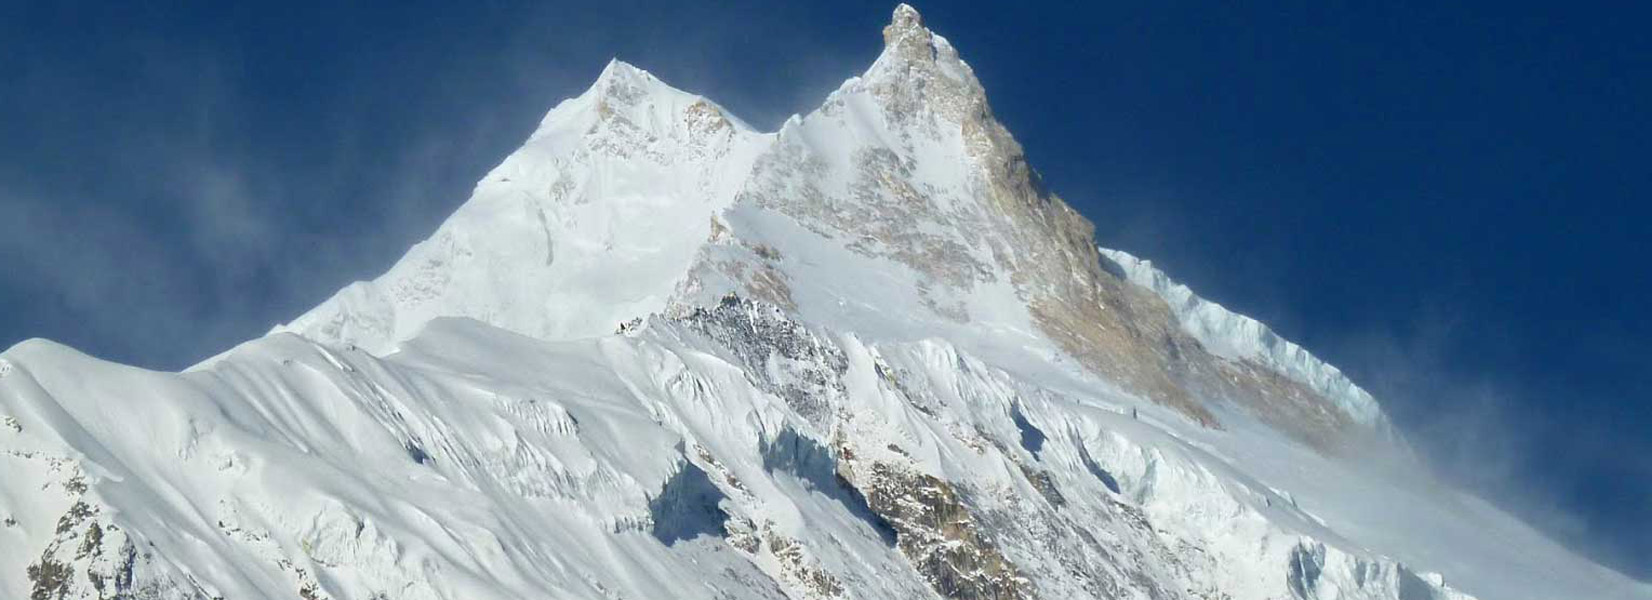 Mt.-Manaslu-Expedition